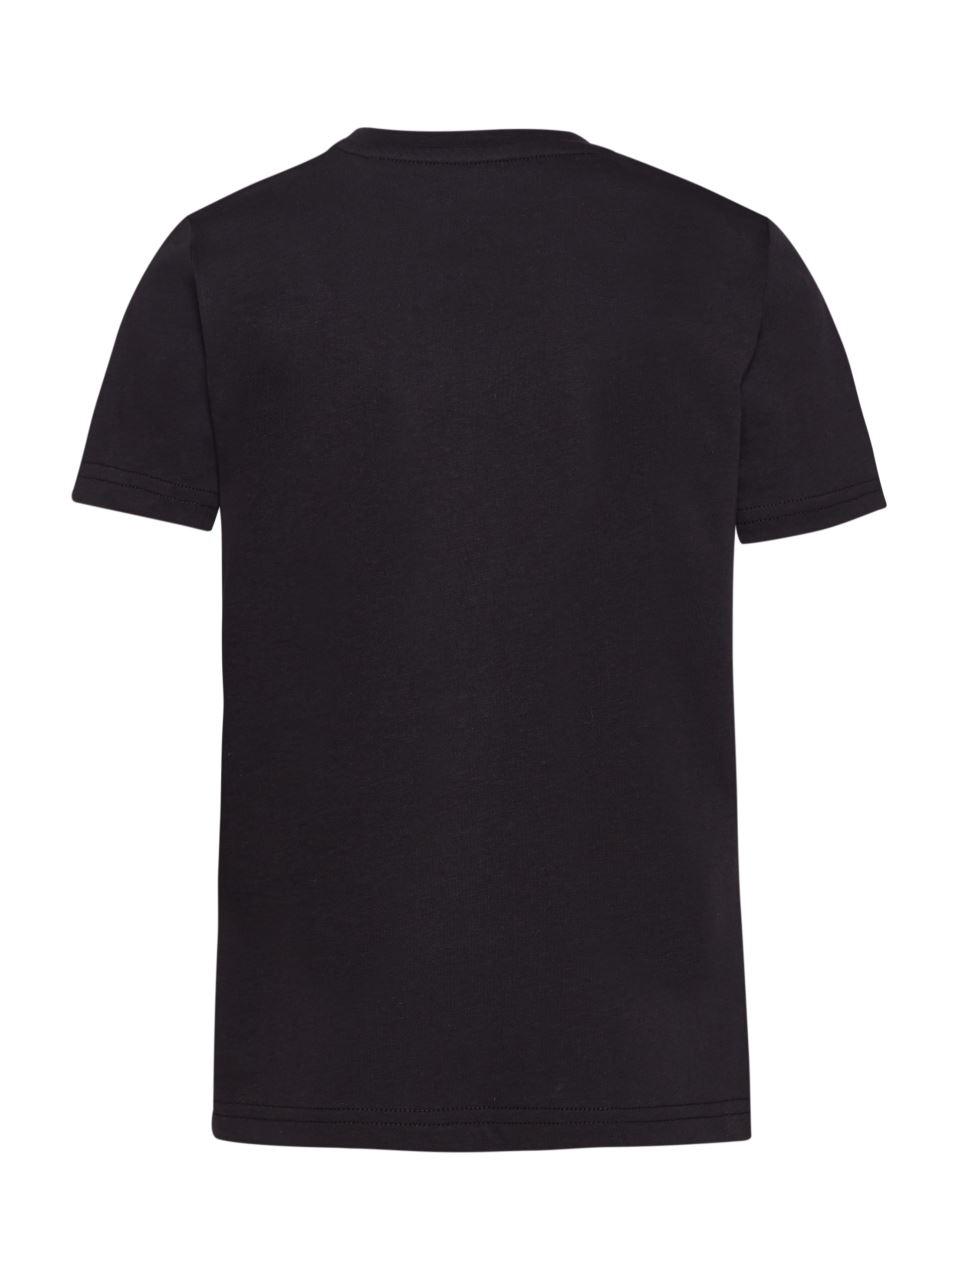 C191260 22 Vazgeçmeyenlerin Zafer T-shirt (Çocuk)